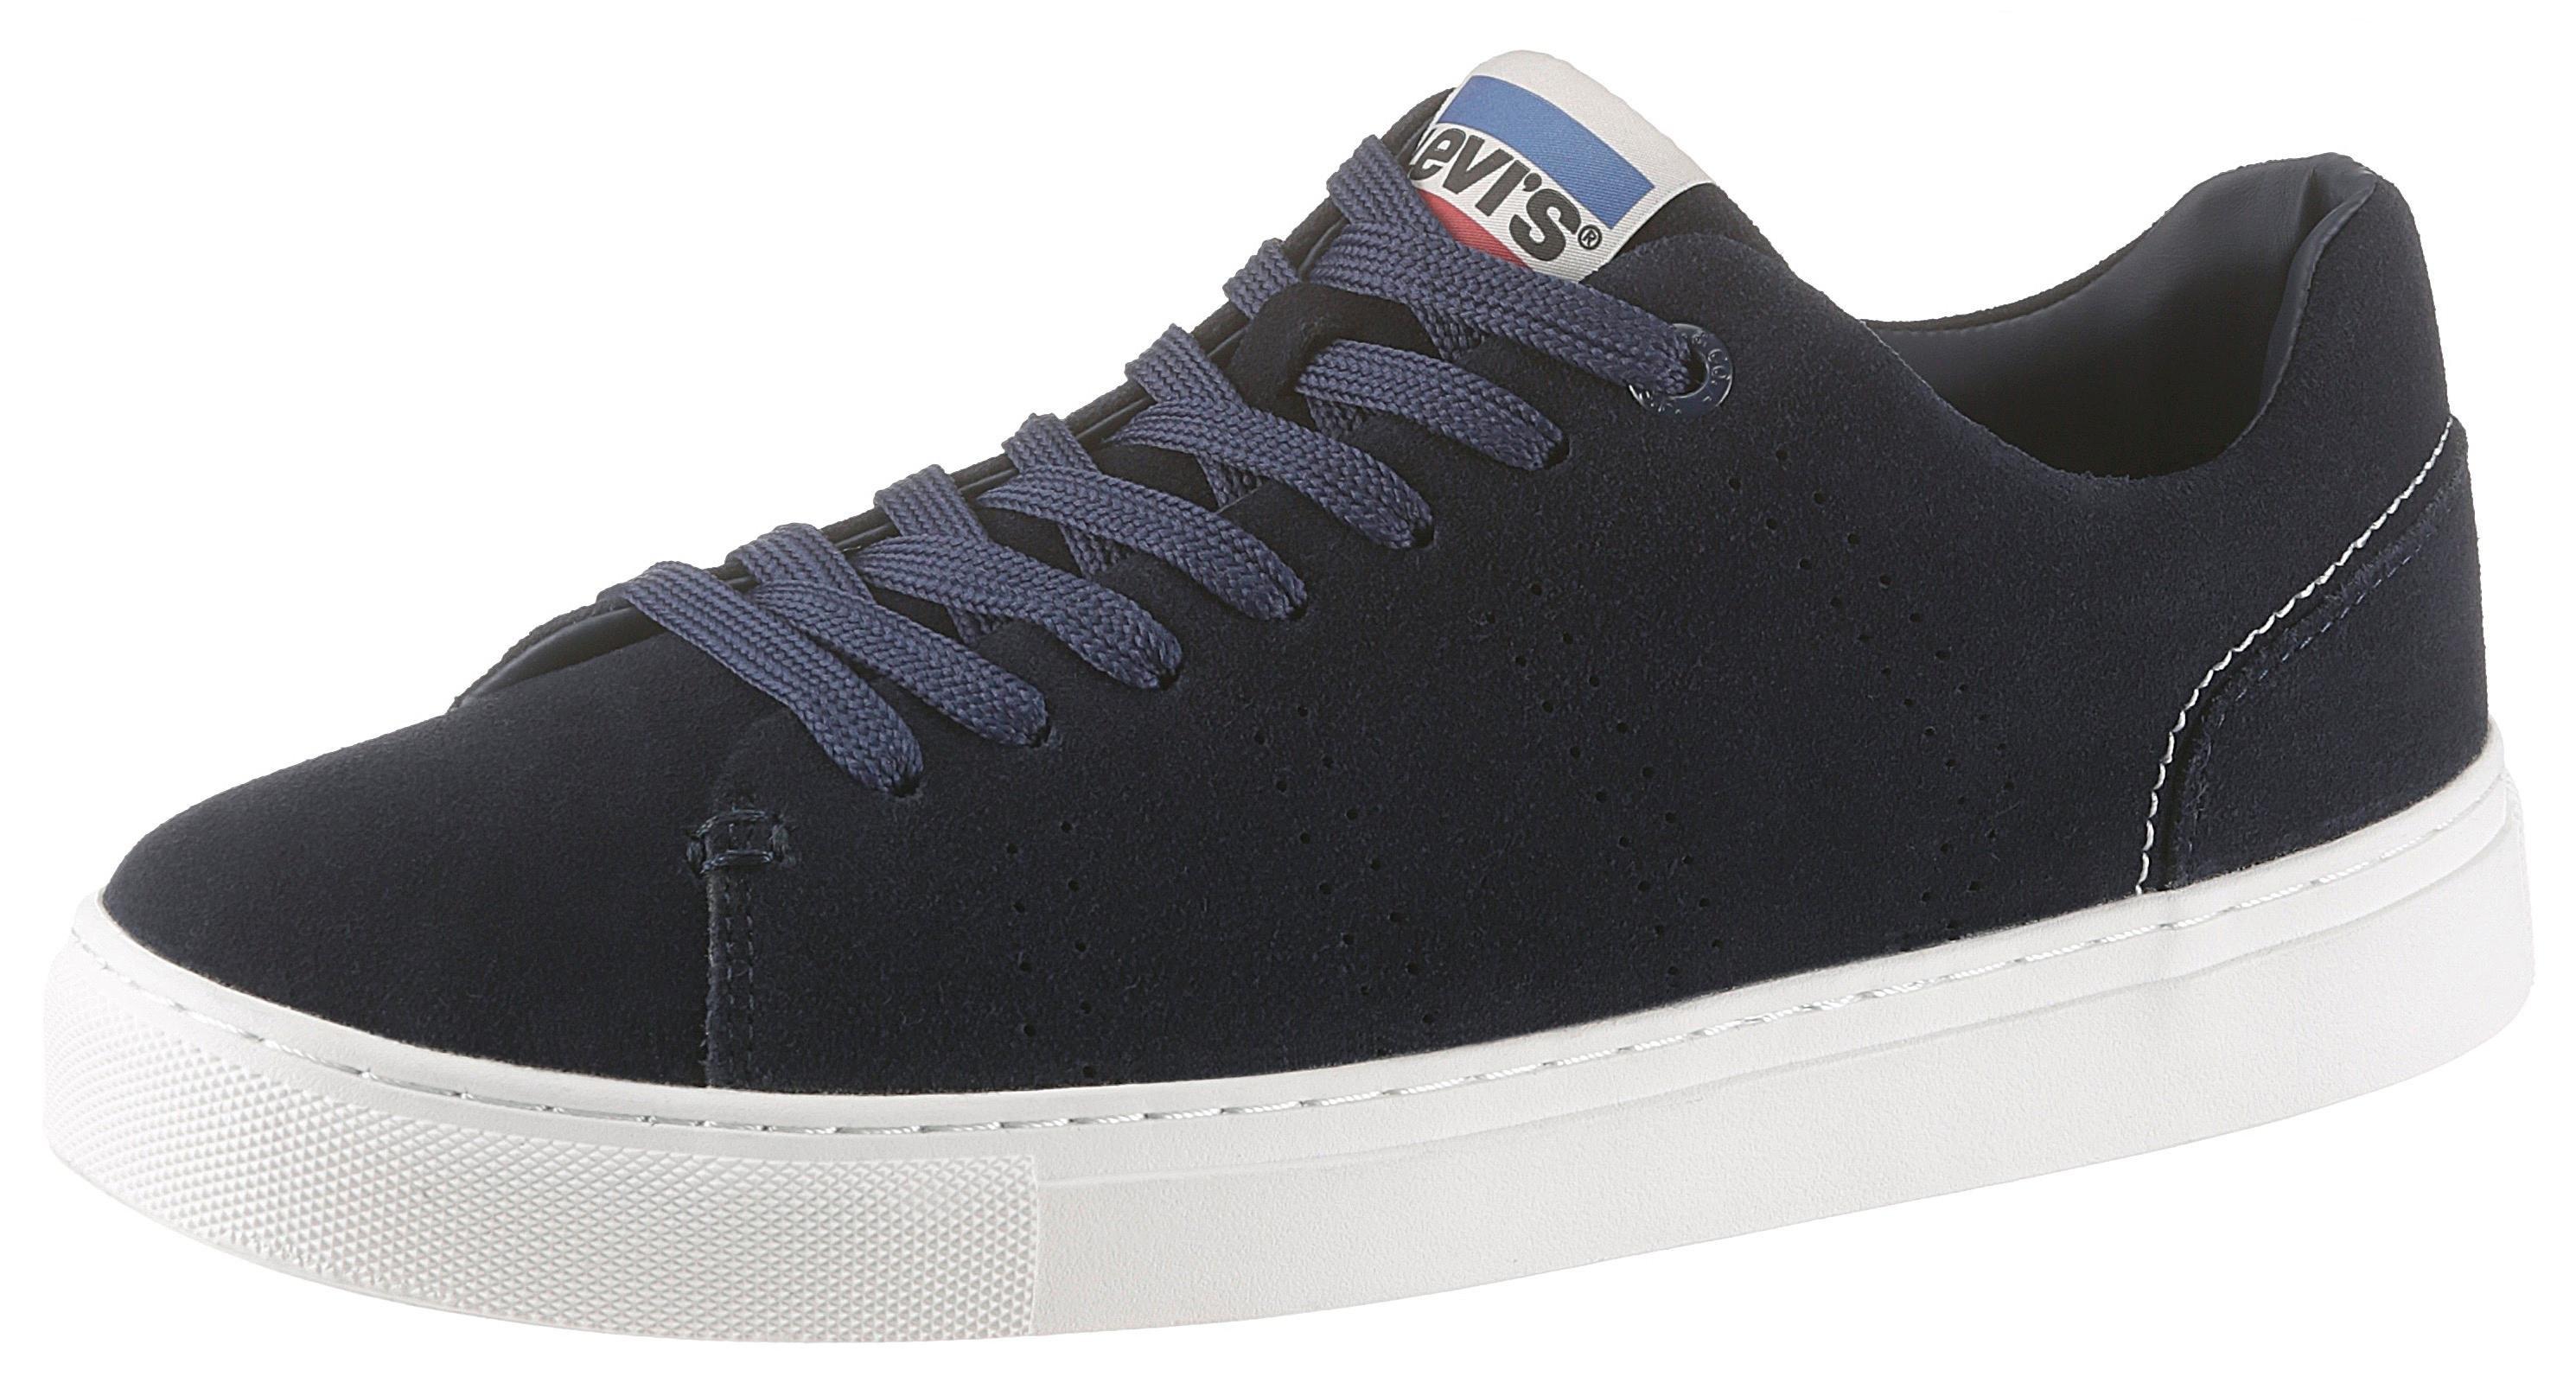 Levi's® Sneakersvernon Online Sneakersvernon Levi's® Bestellen Online Sneakersvernon Bestellen Levi's® Online 0wnOvmN8